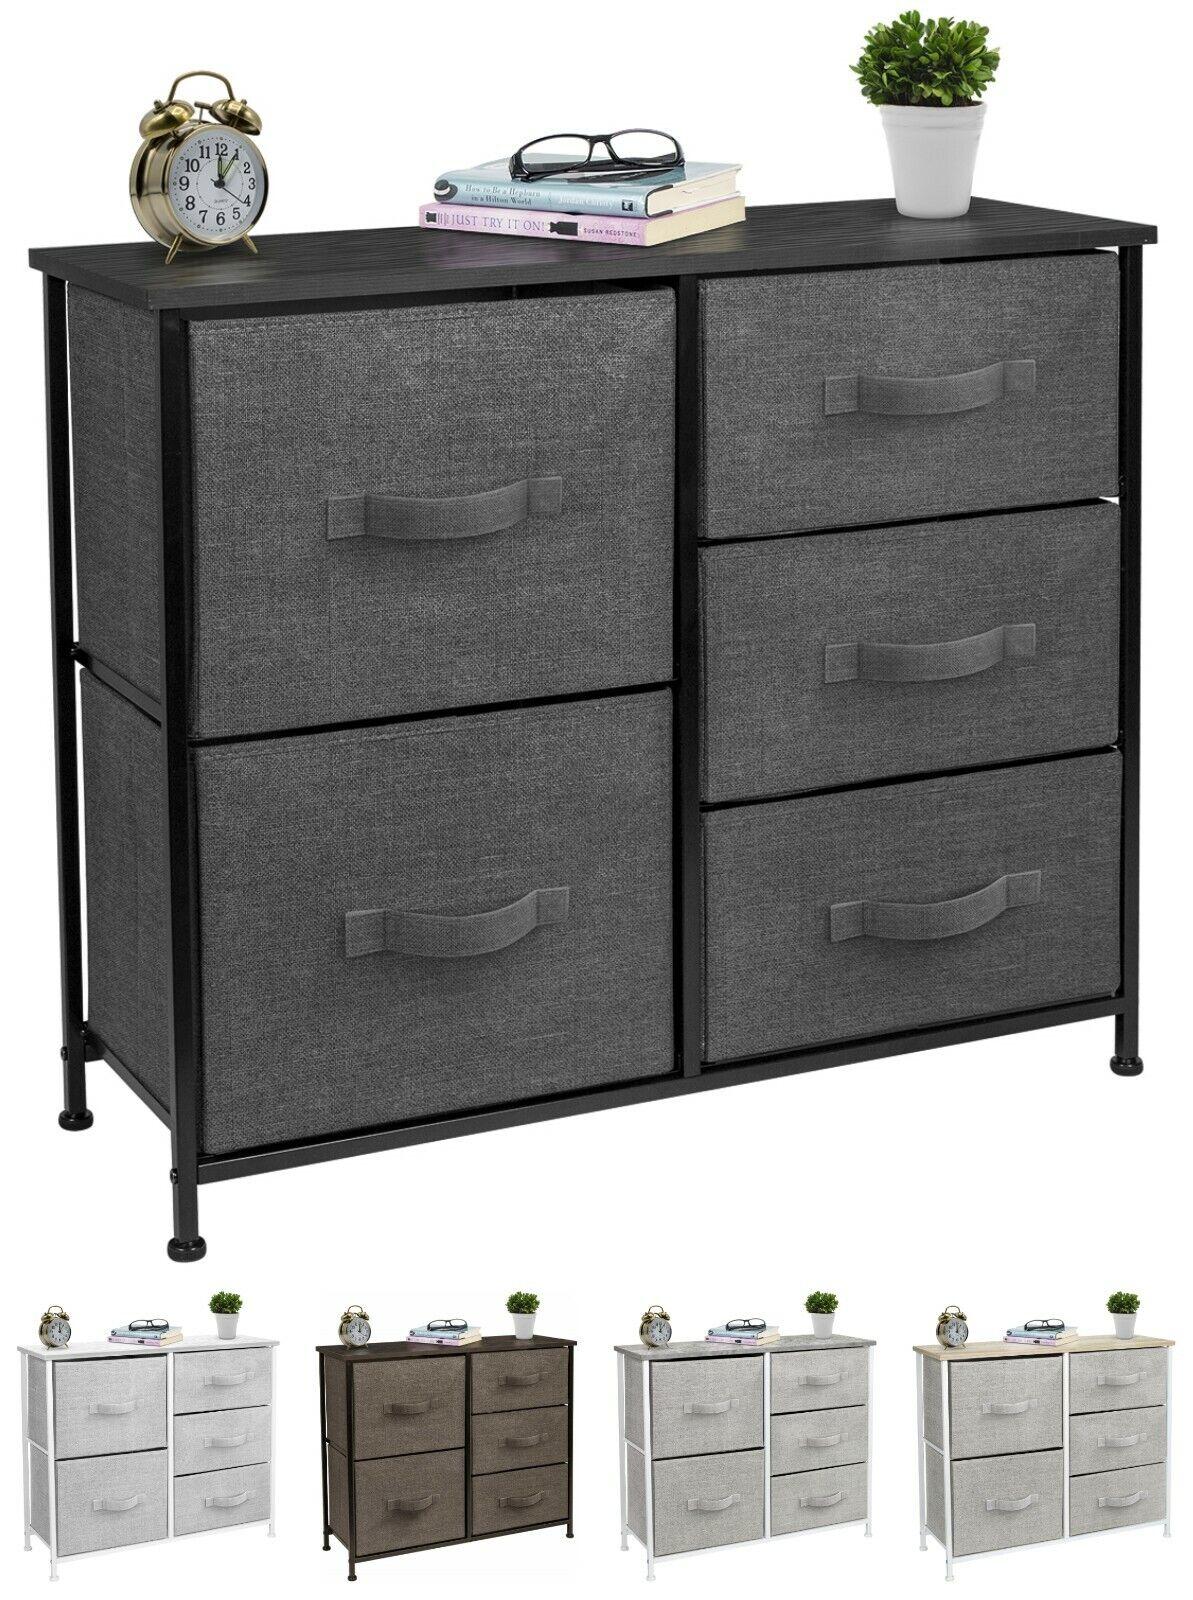 Wooden Dressers For Bedroom Extra Wide Dresser Storage Tower Unit 5 Drawers Home For Sale Online Ebay